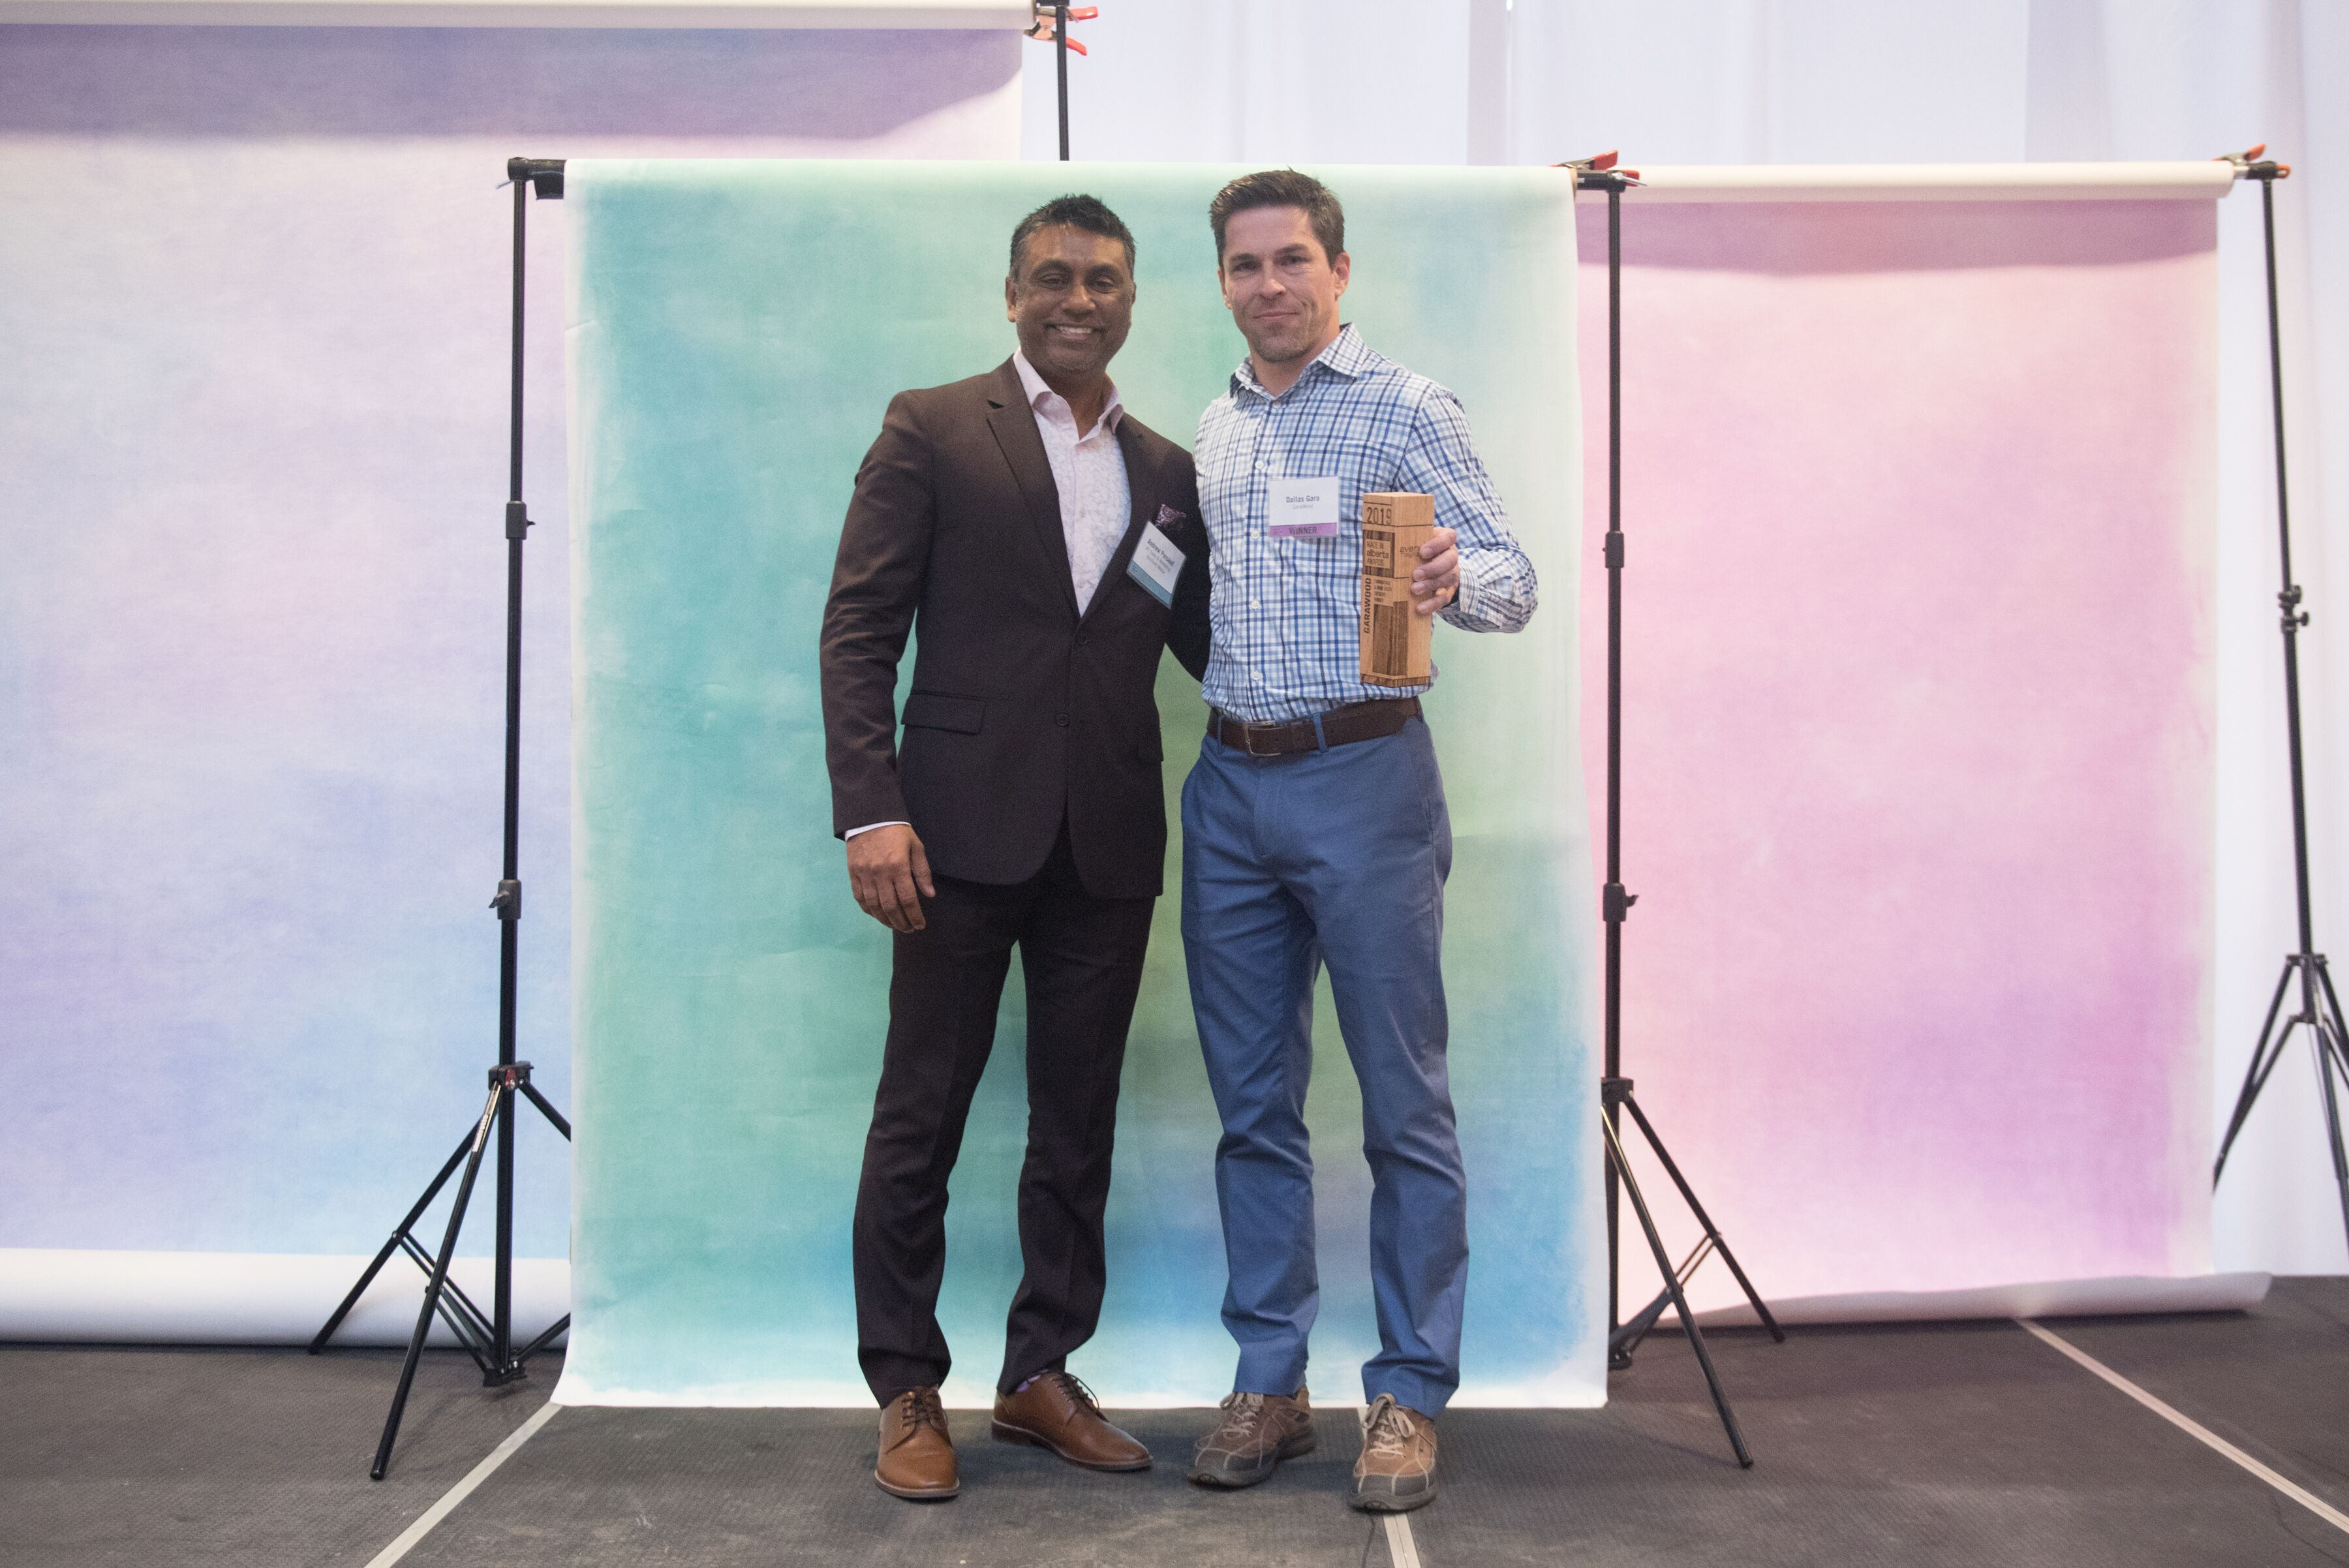 Made in Alberta Awards 2019